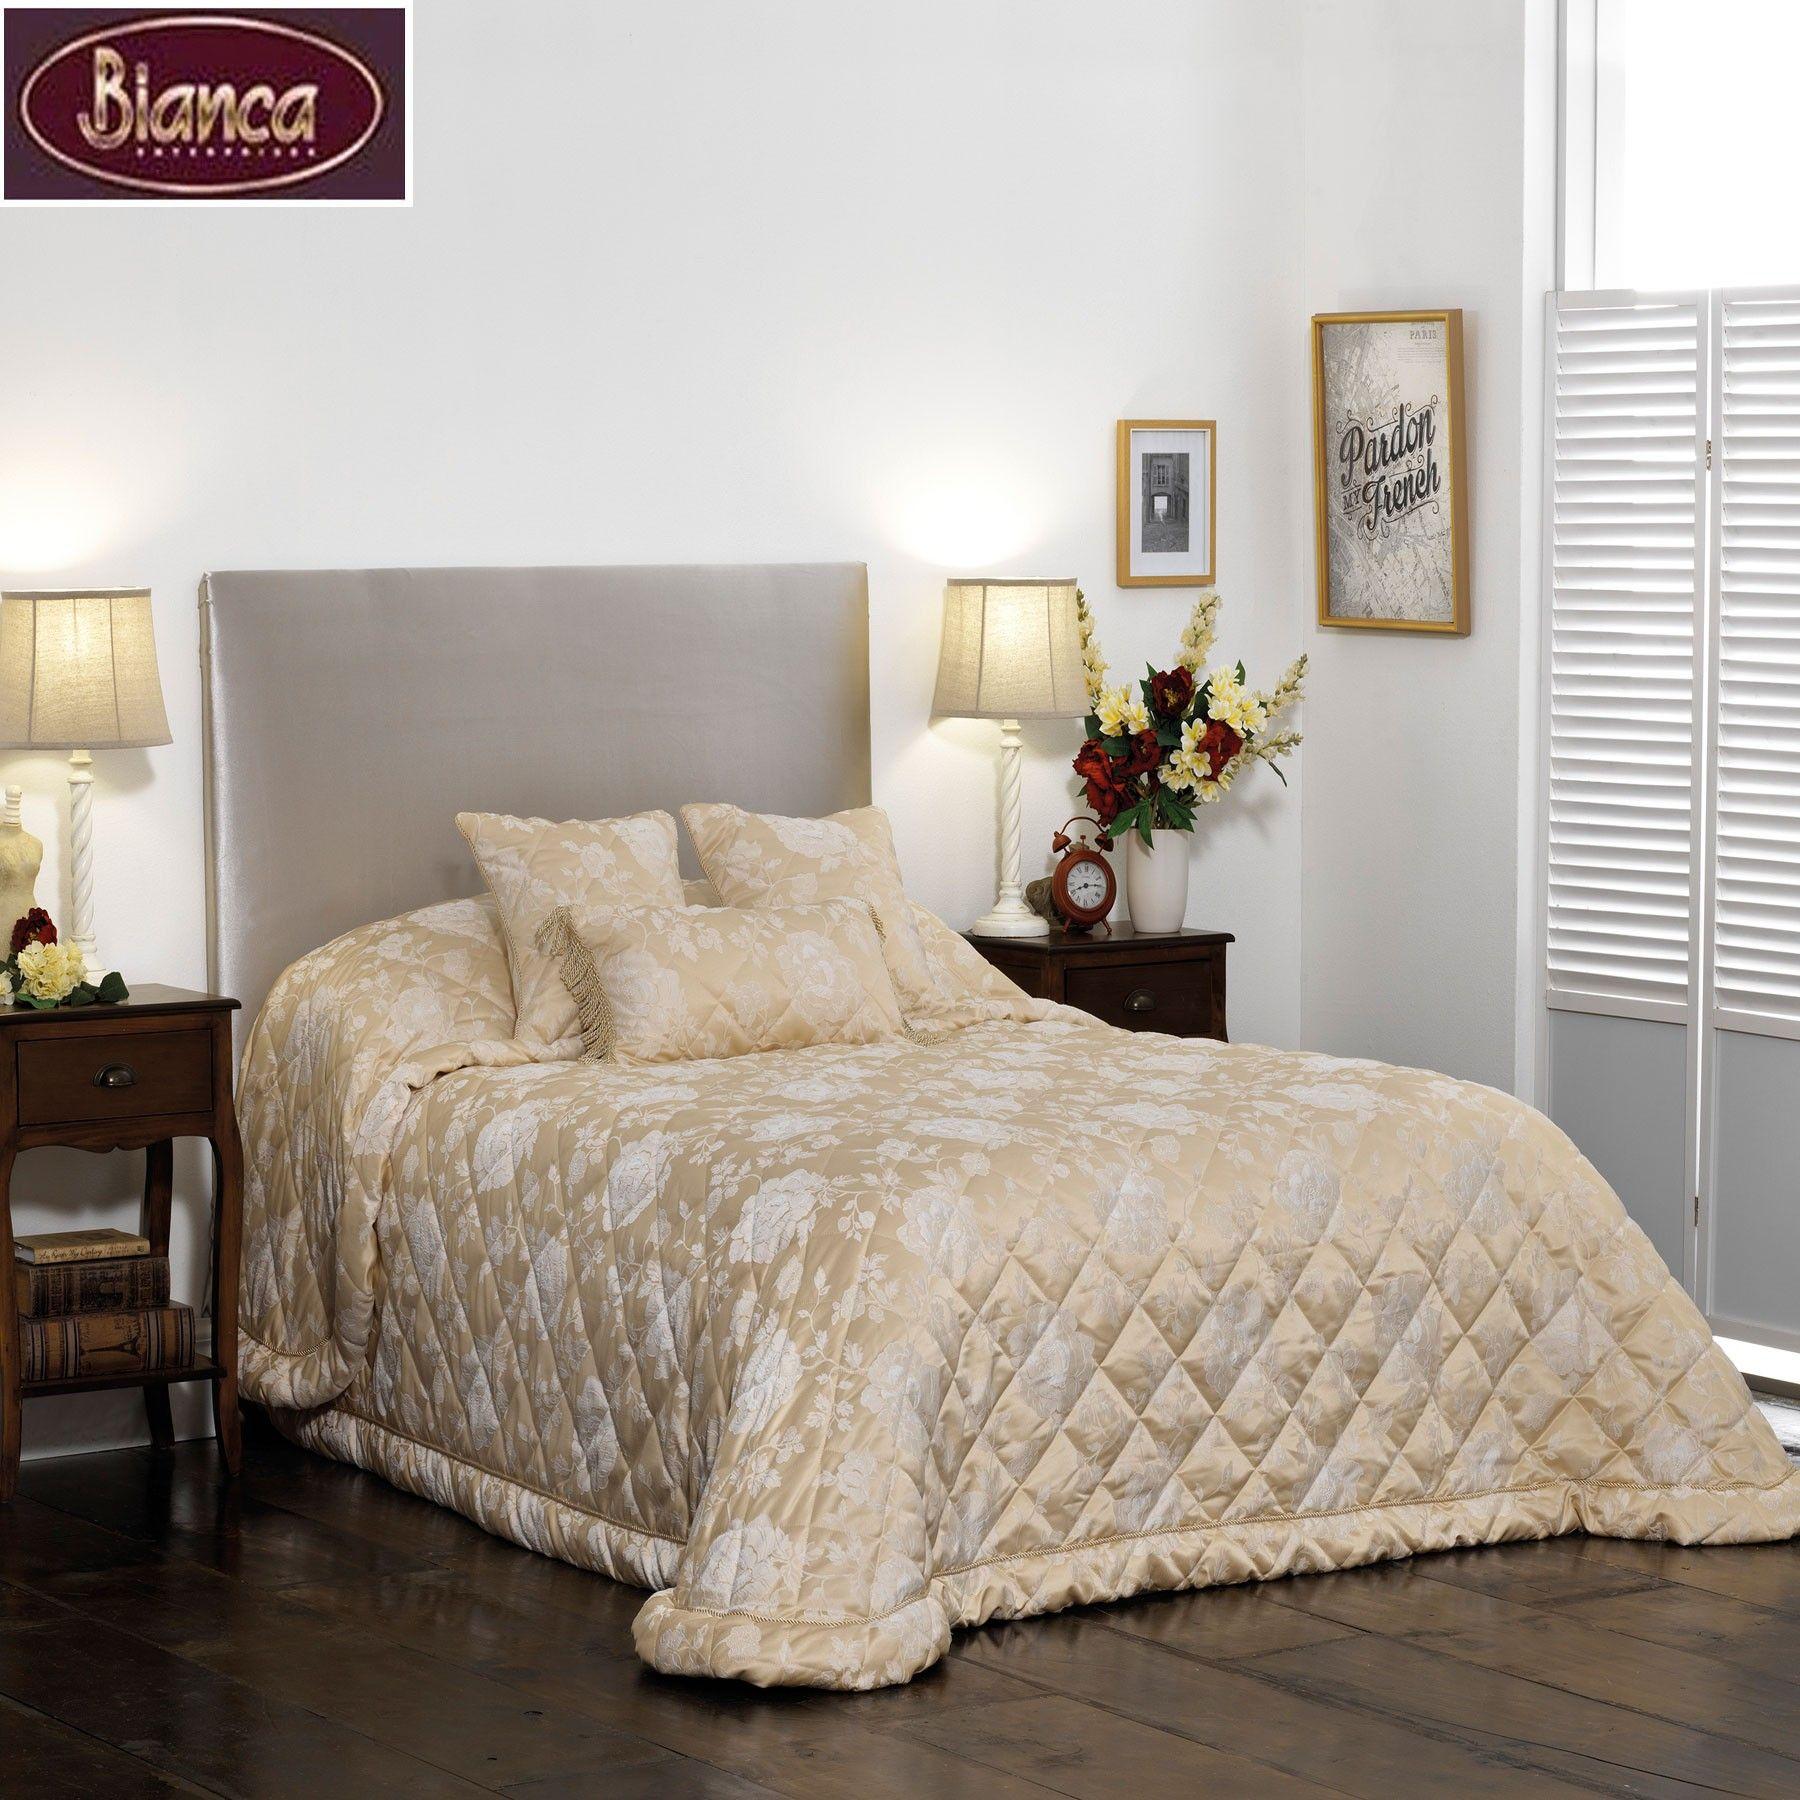 opulent design cream bedding. Isabel Cream Bedspread by Bianca  Bedspreads Coverlets